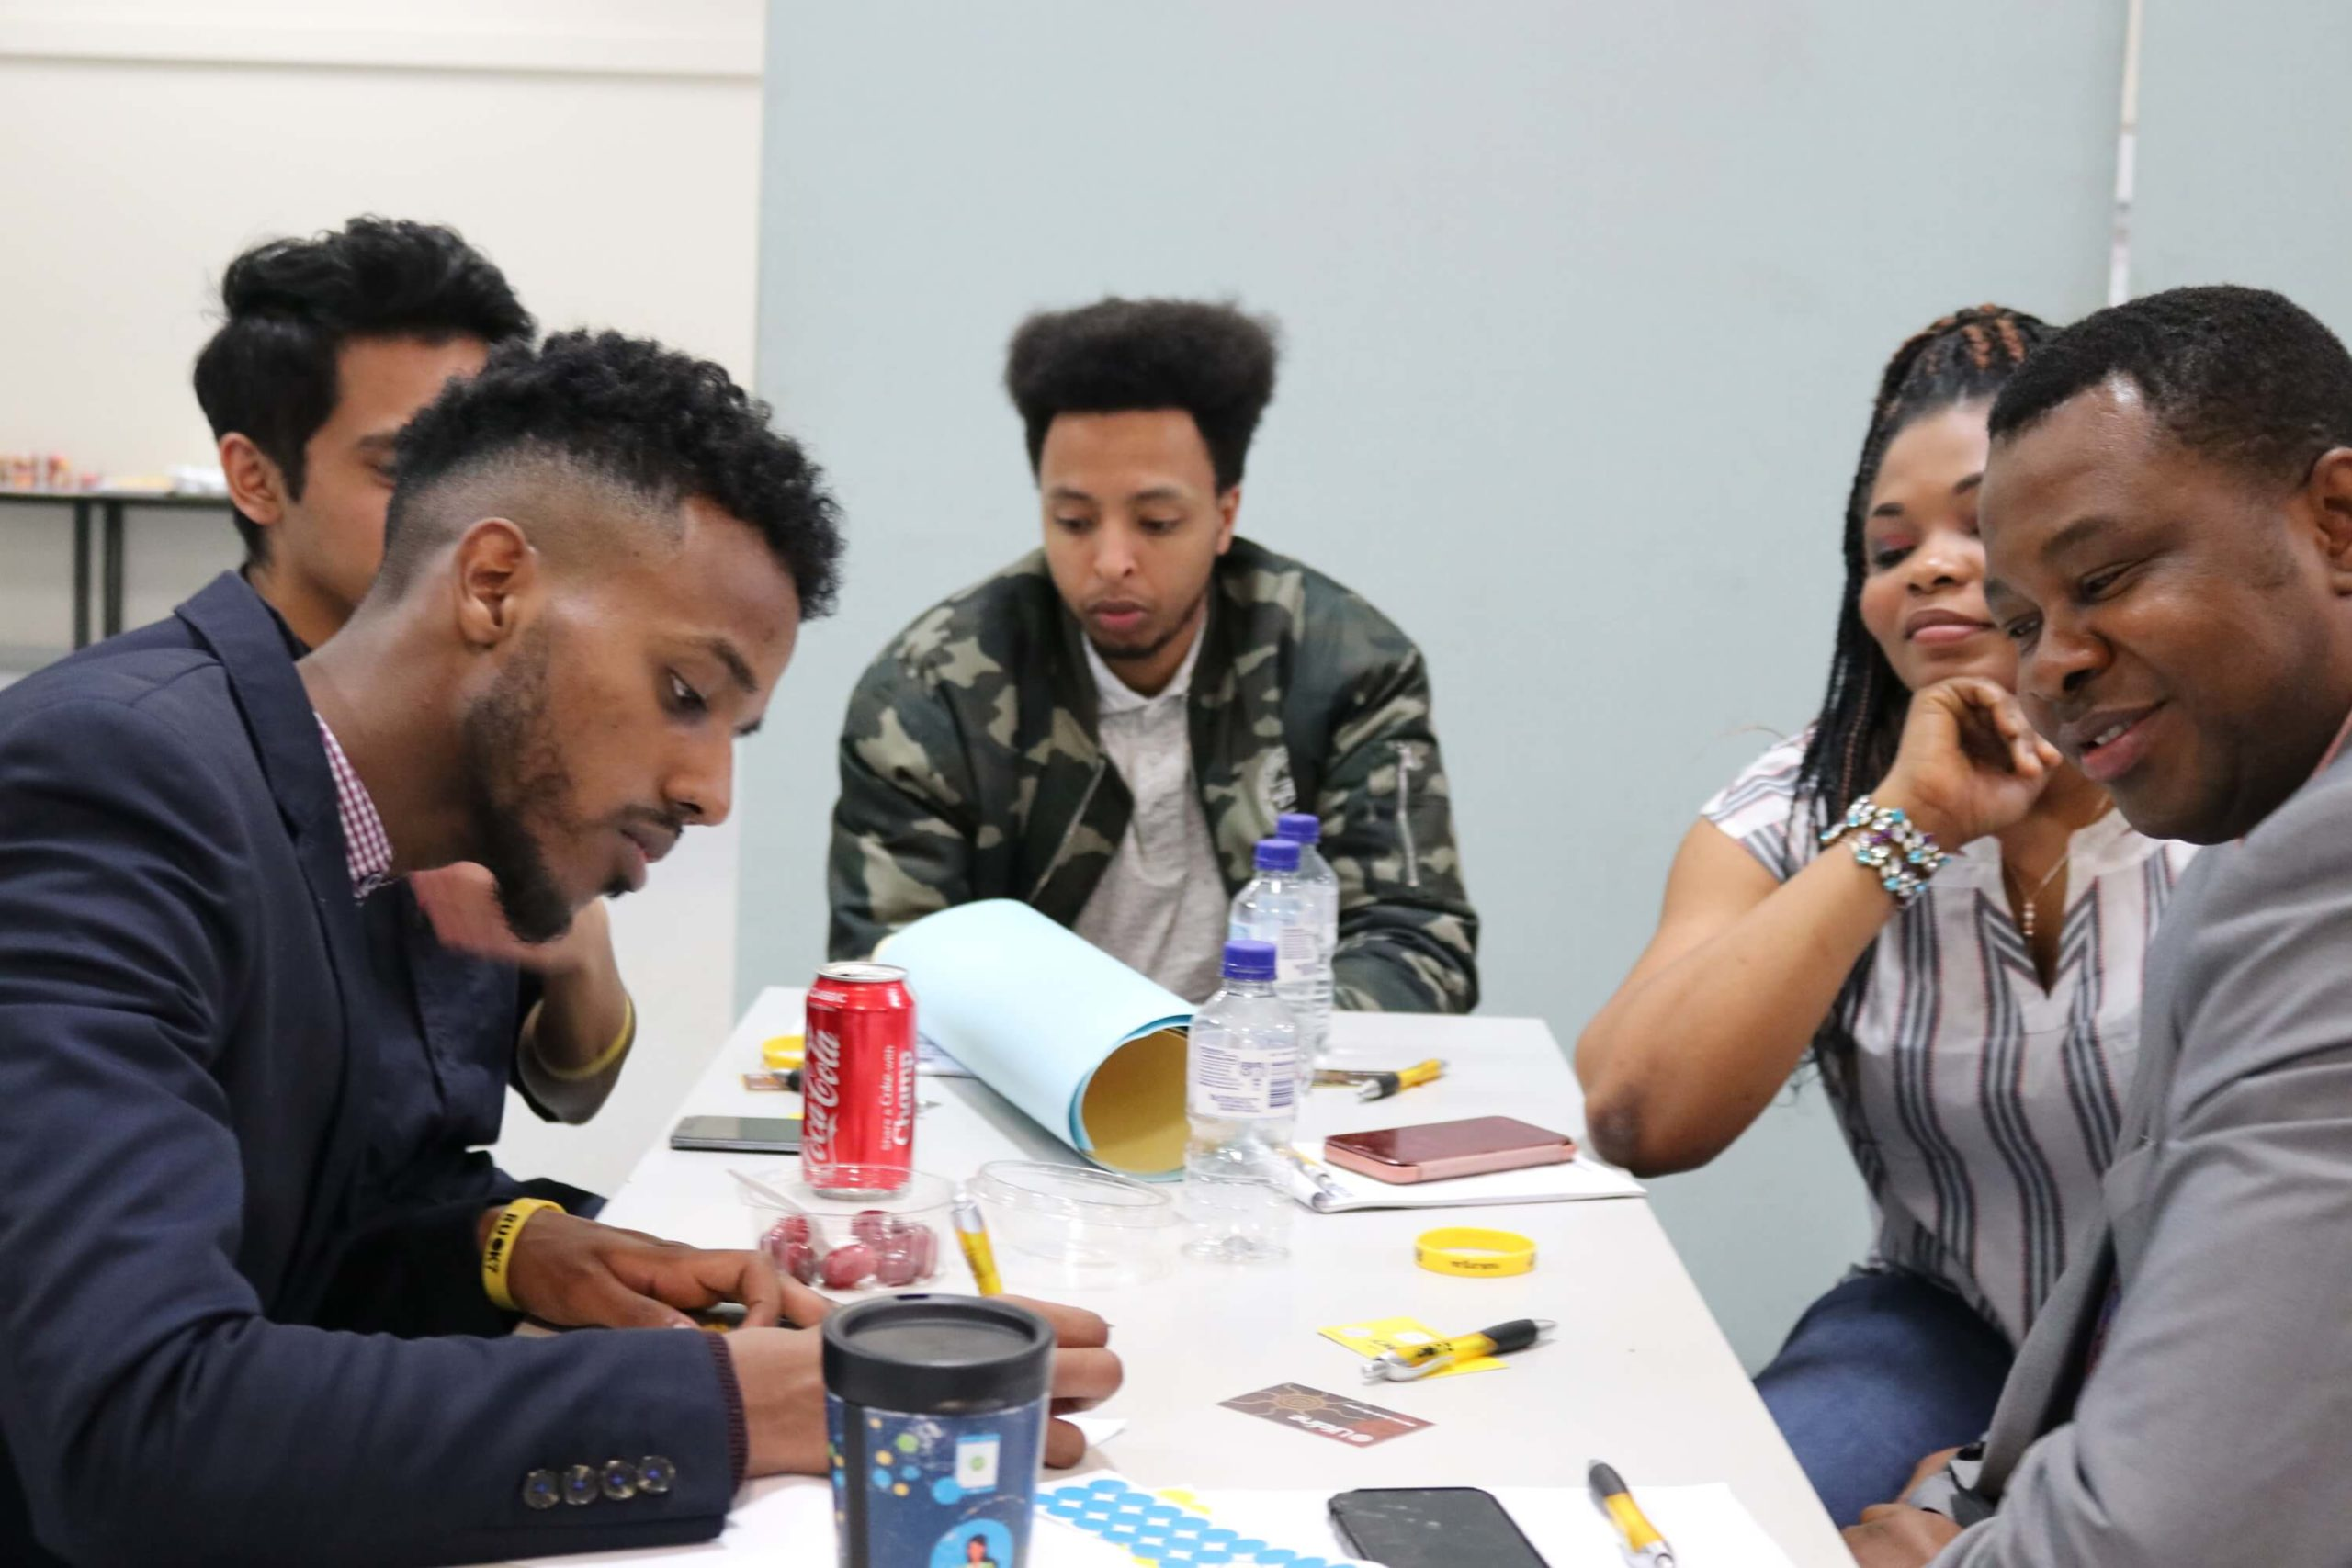 global youth mental health awareness 5